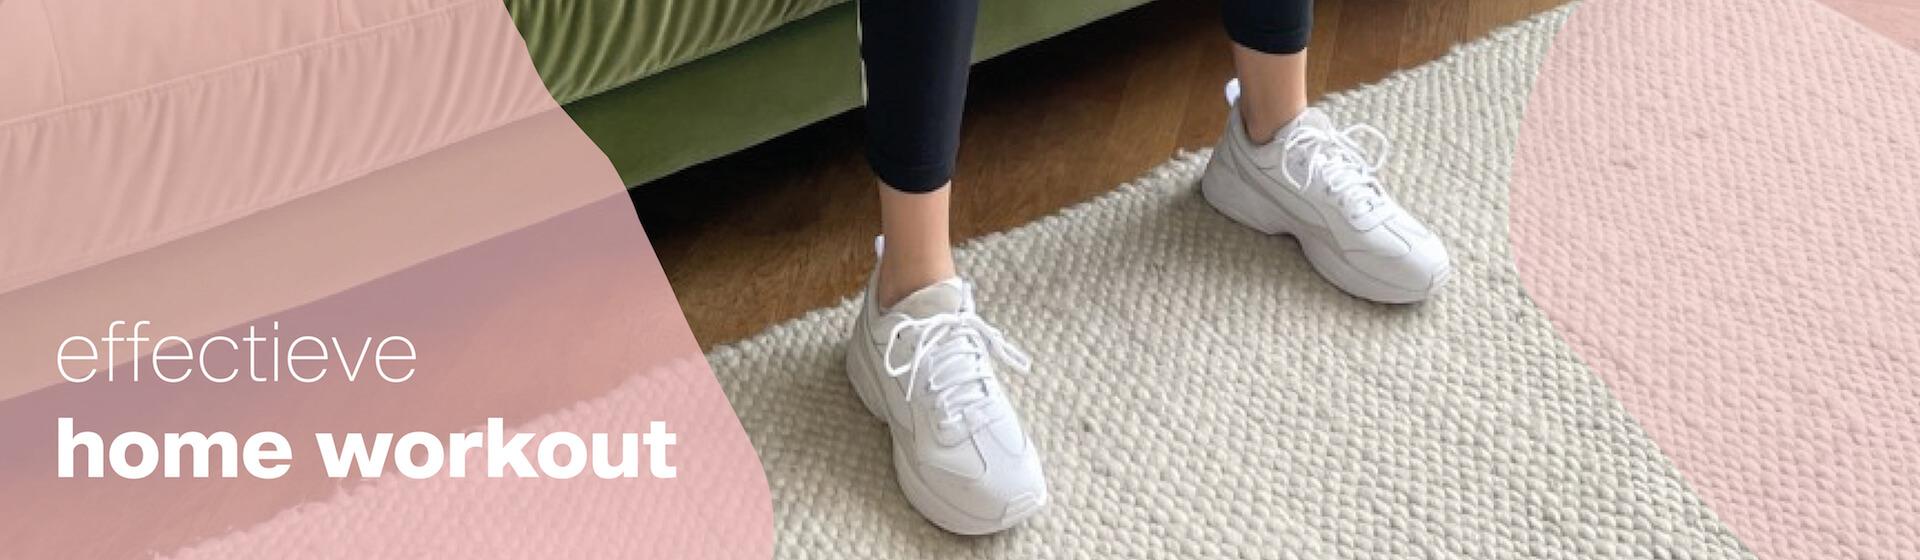 effectieve home workout